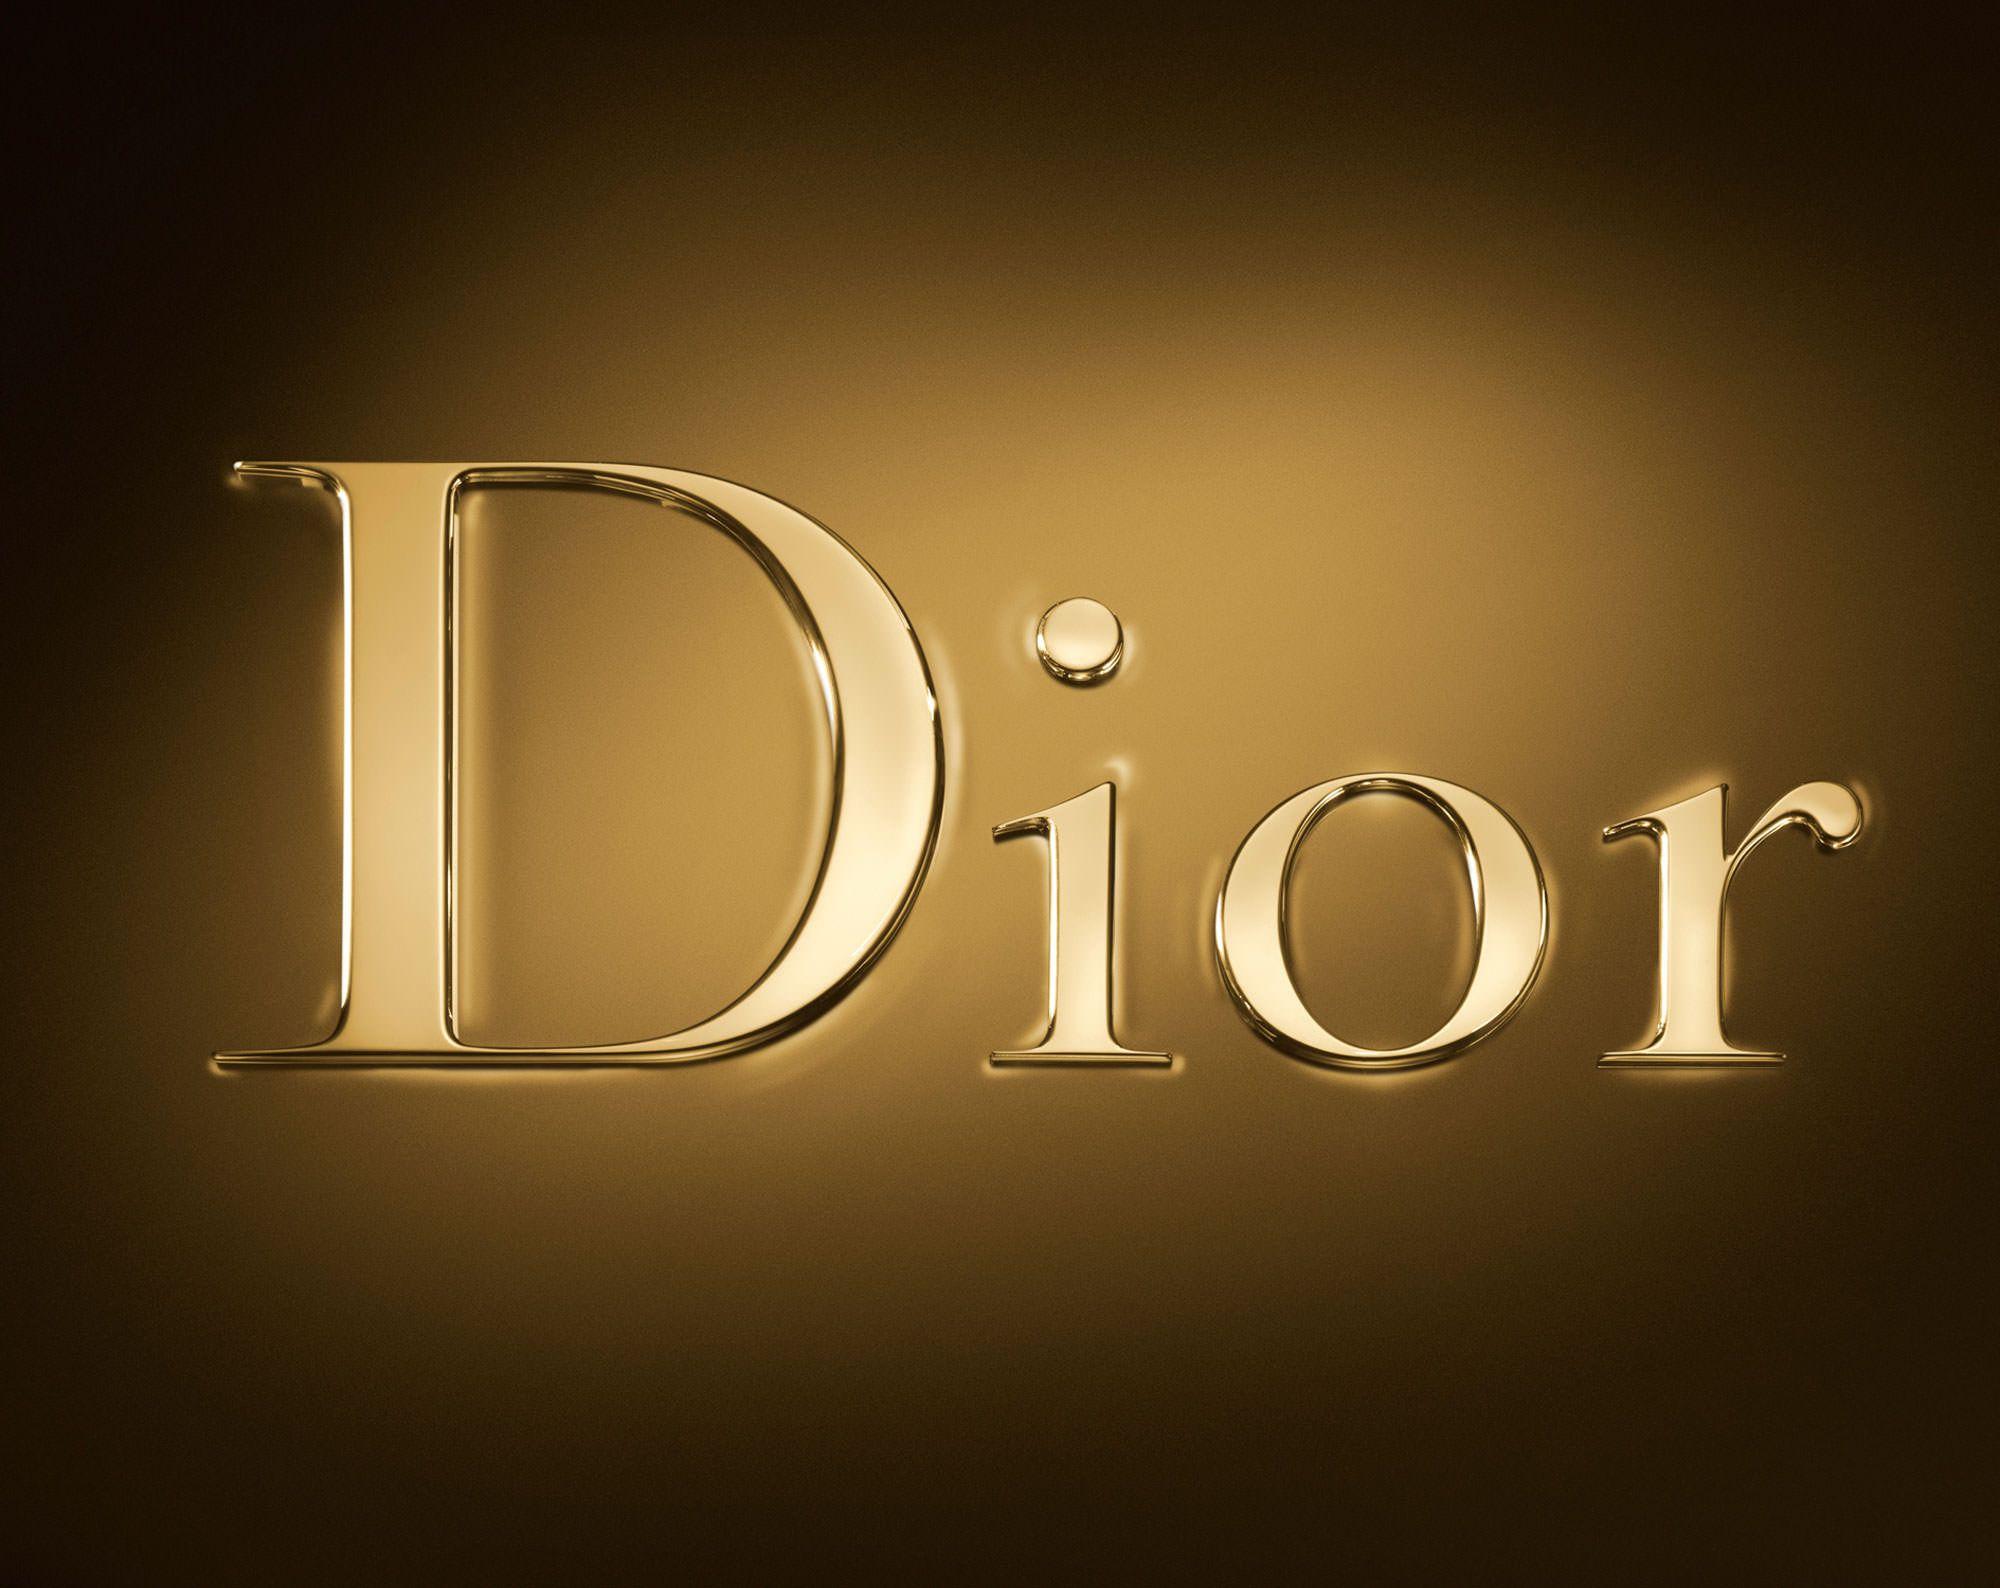 Image associée | CHRISTIAN DIOR, Le monde | Dior logo ...